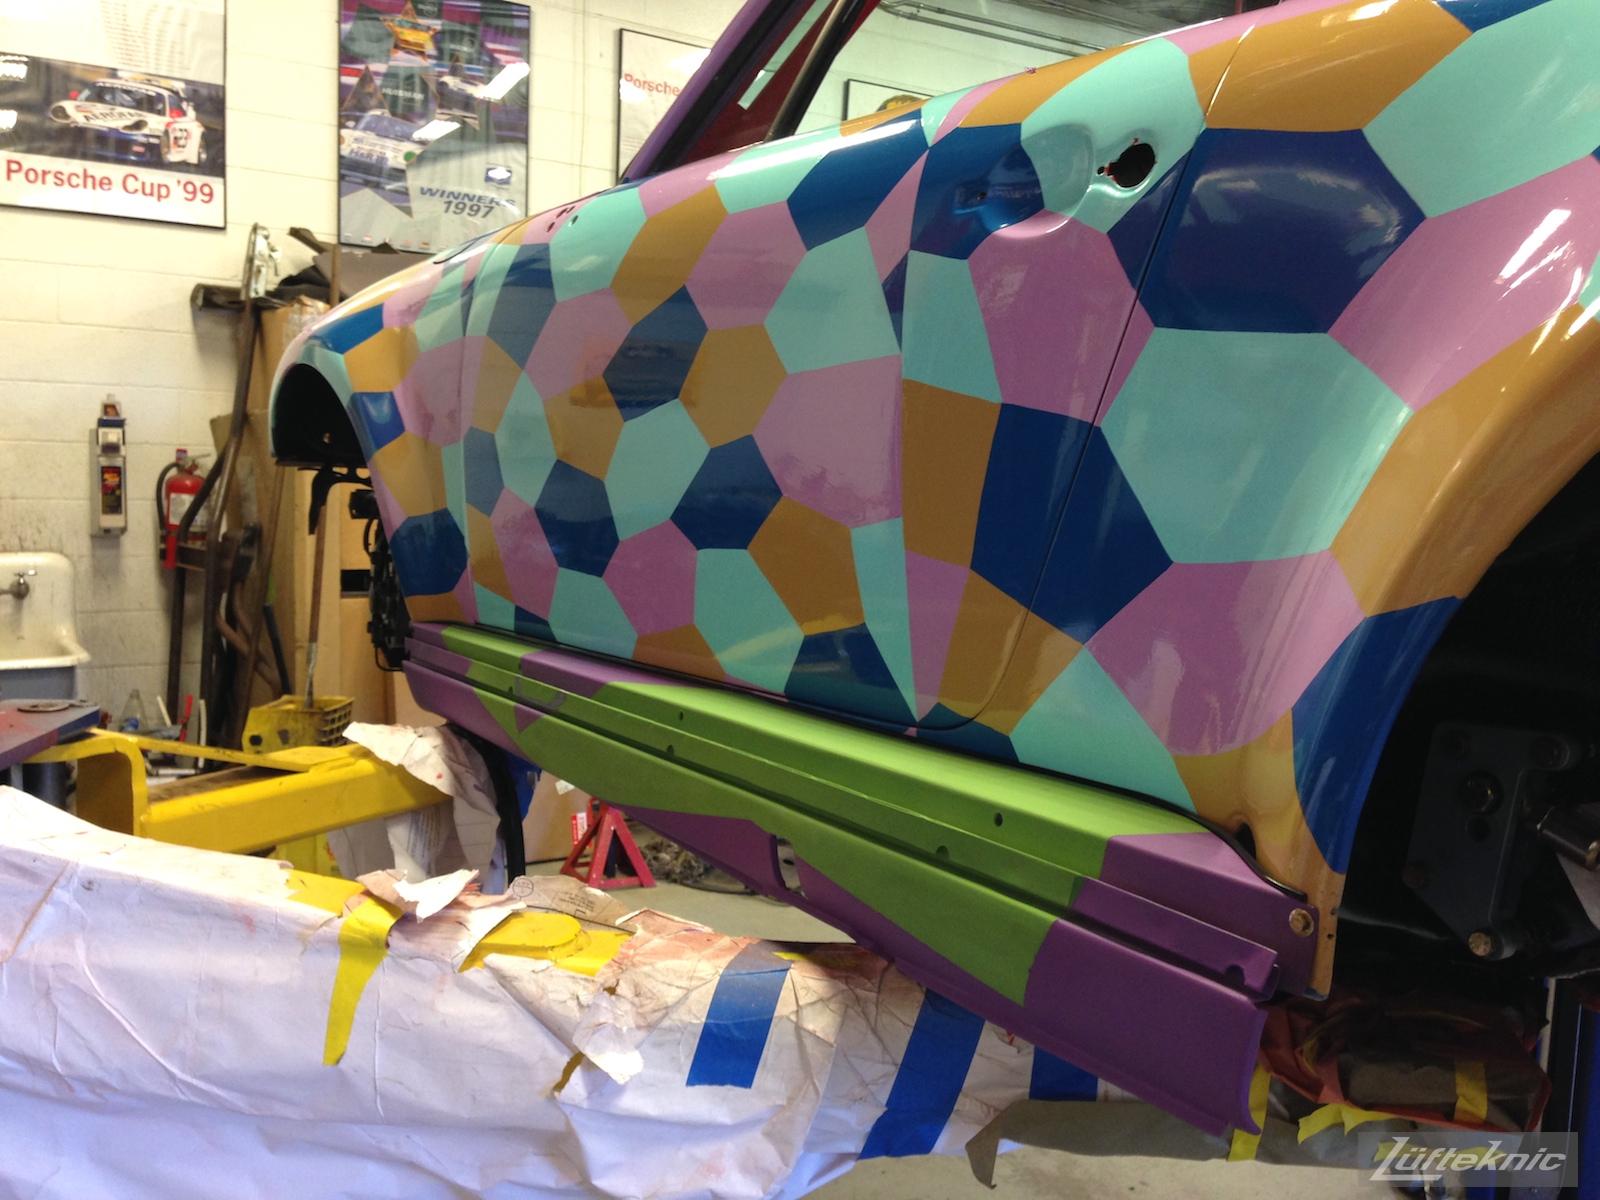 Lüfteknic #projectstuka Porsche 930 Turbo with 930S Turbo rocker panel fitted on driver's side